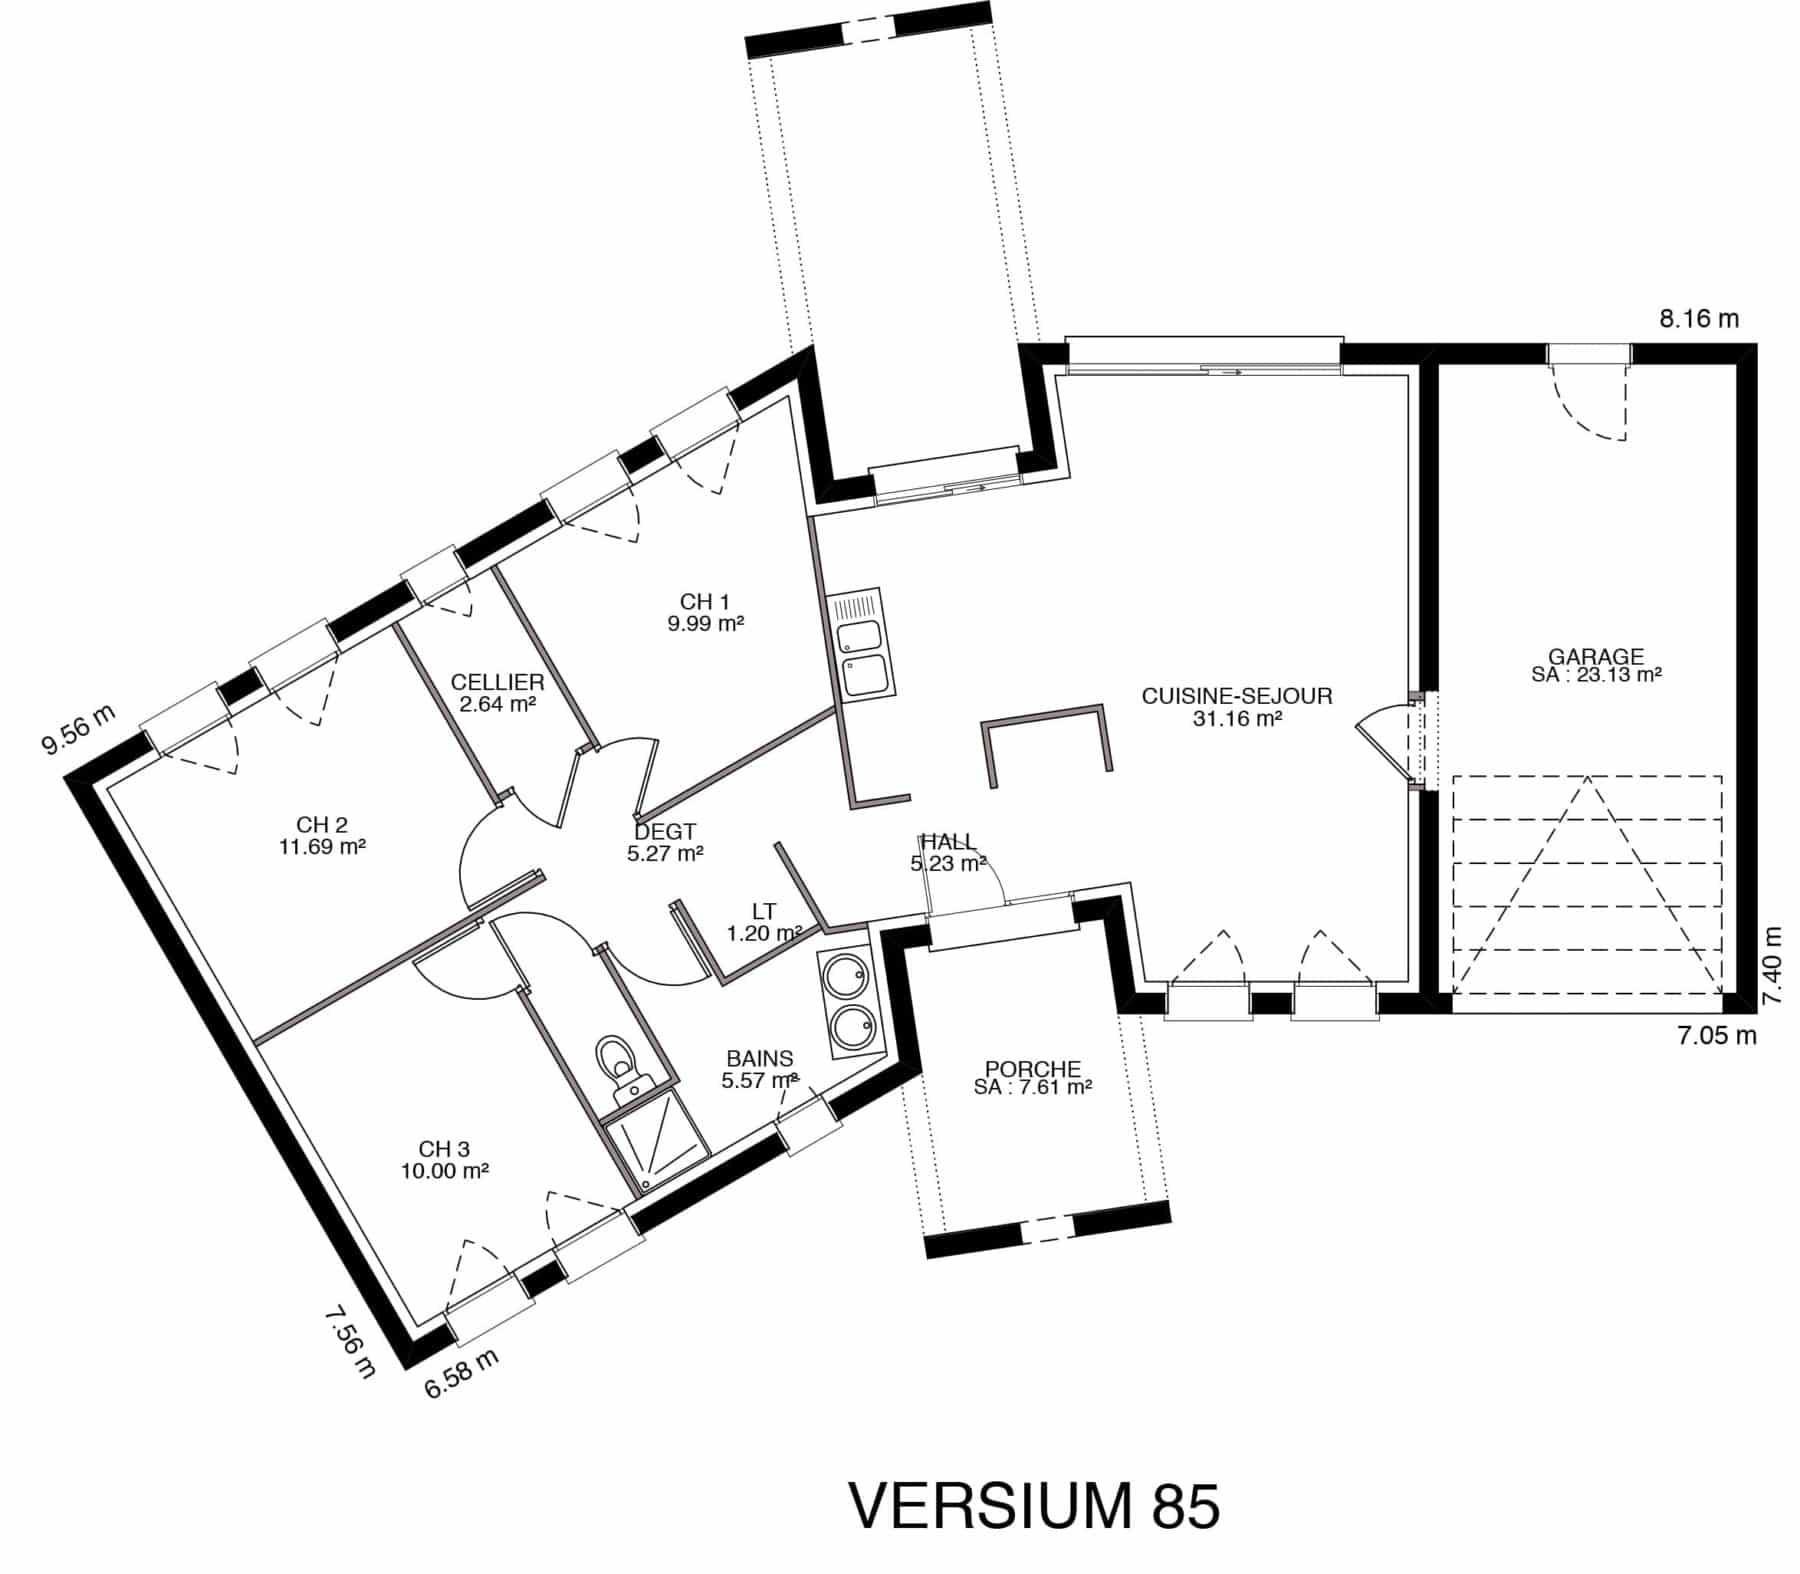 VERSIUM 85